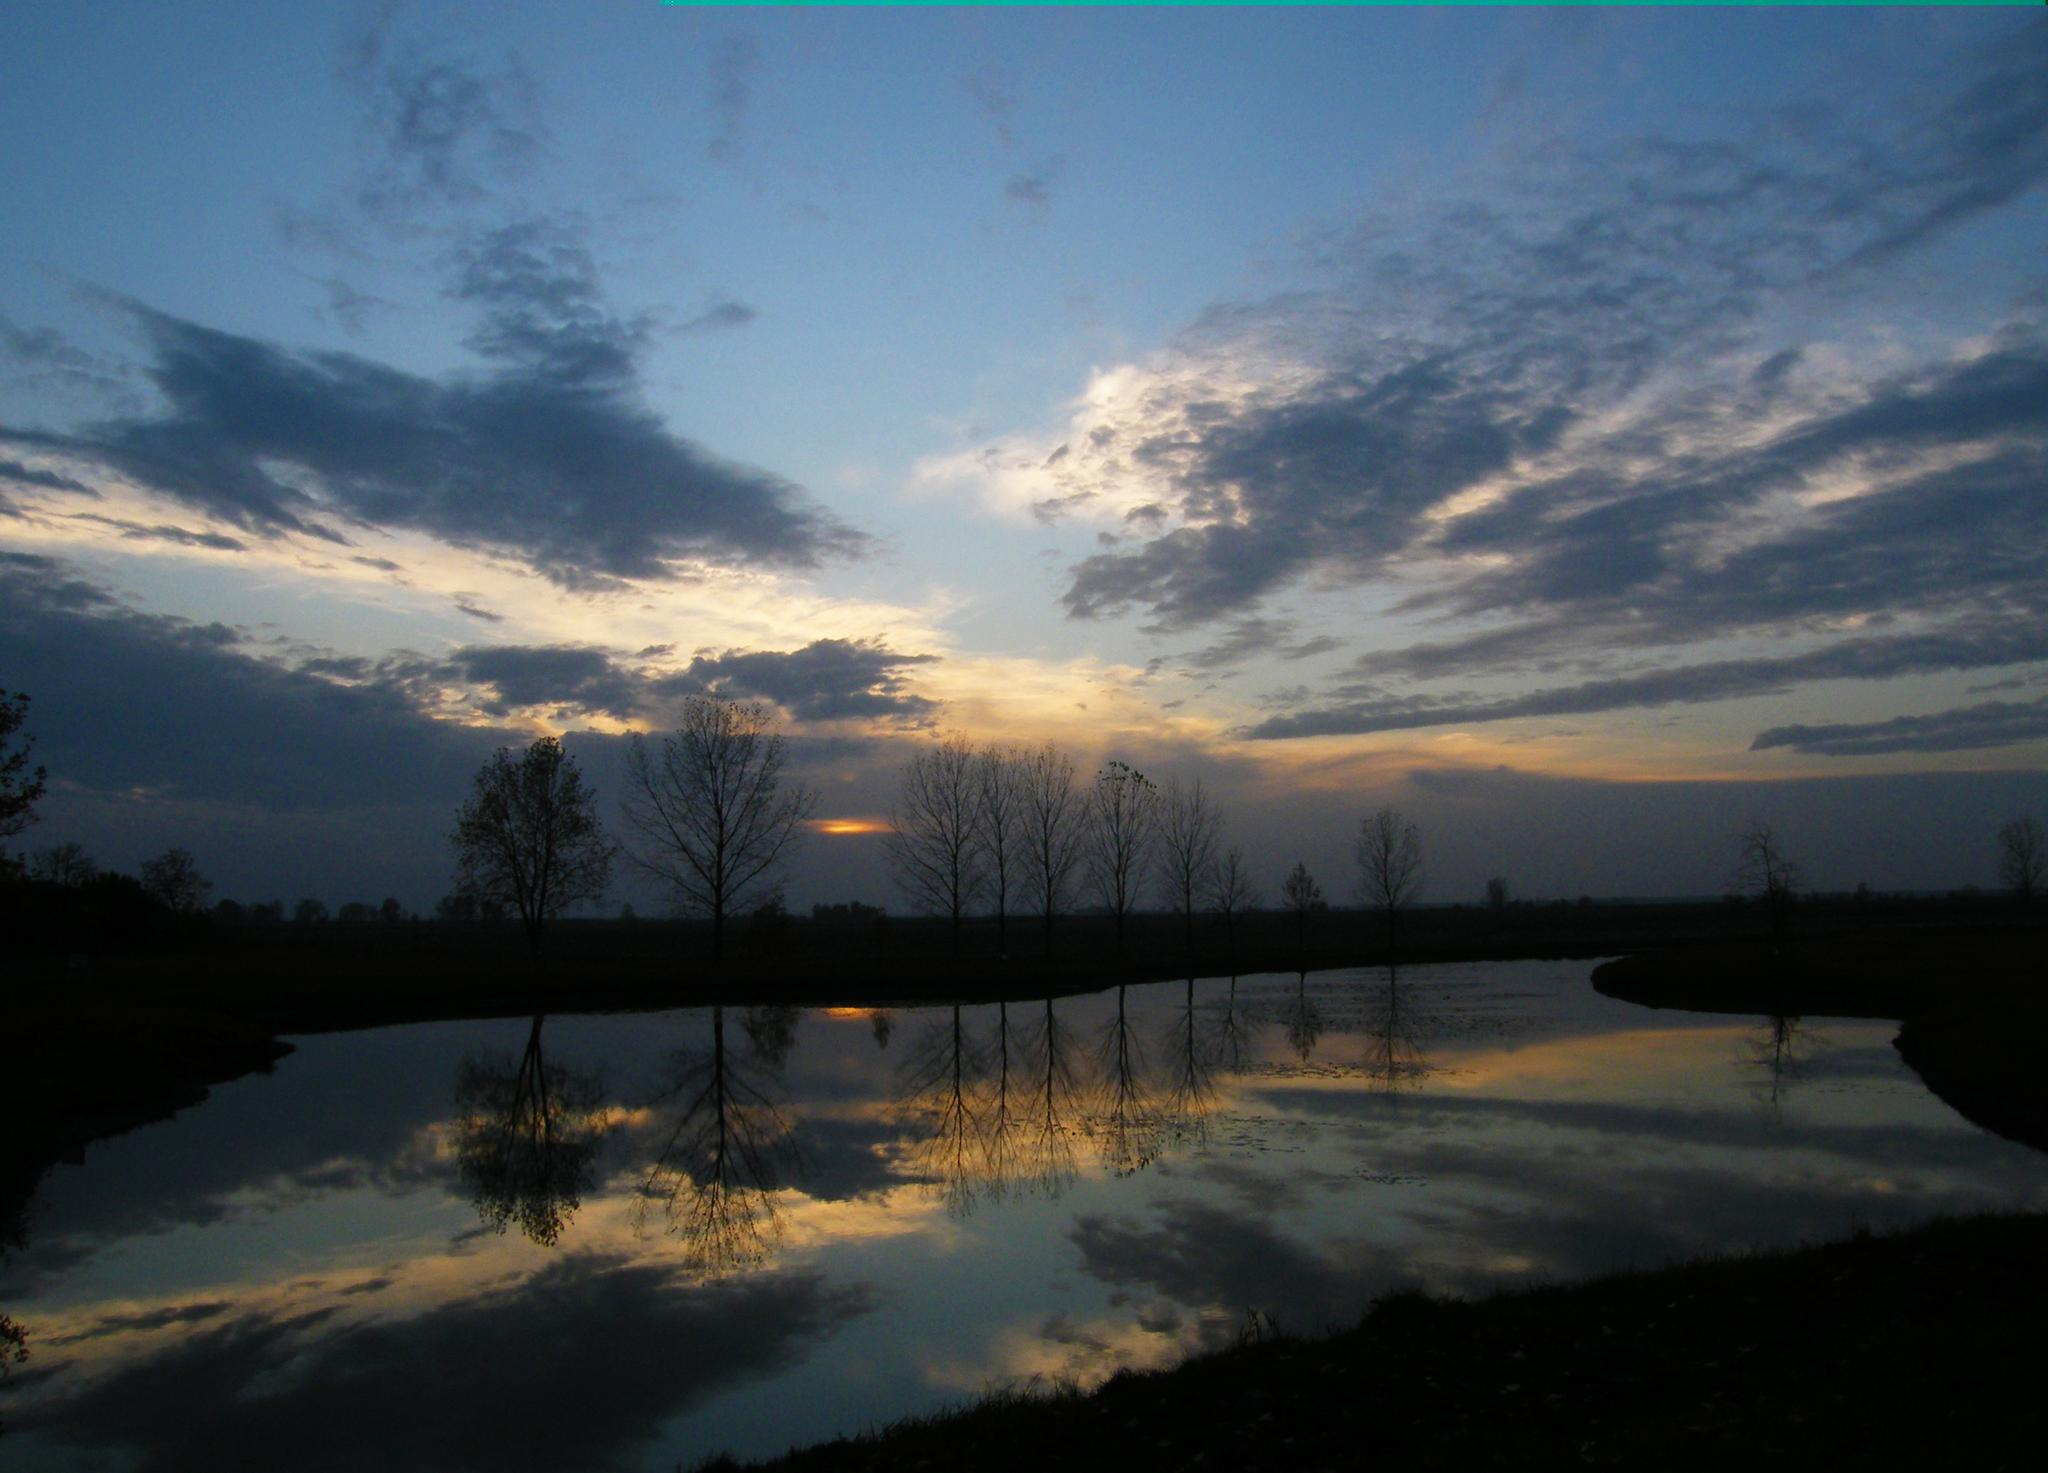 sunset by Banhidai Beata